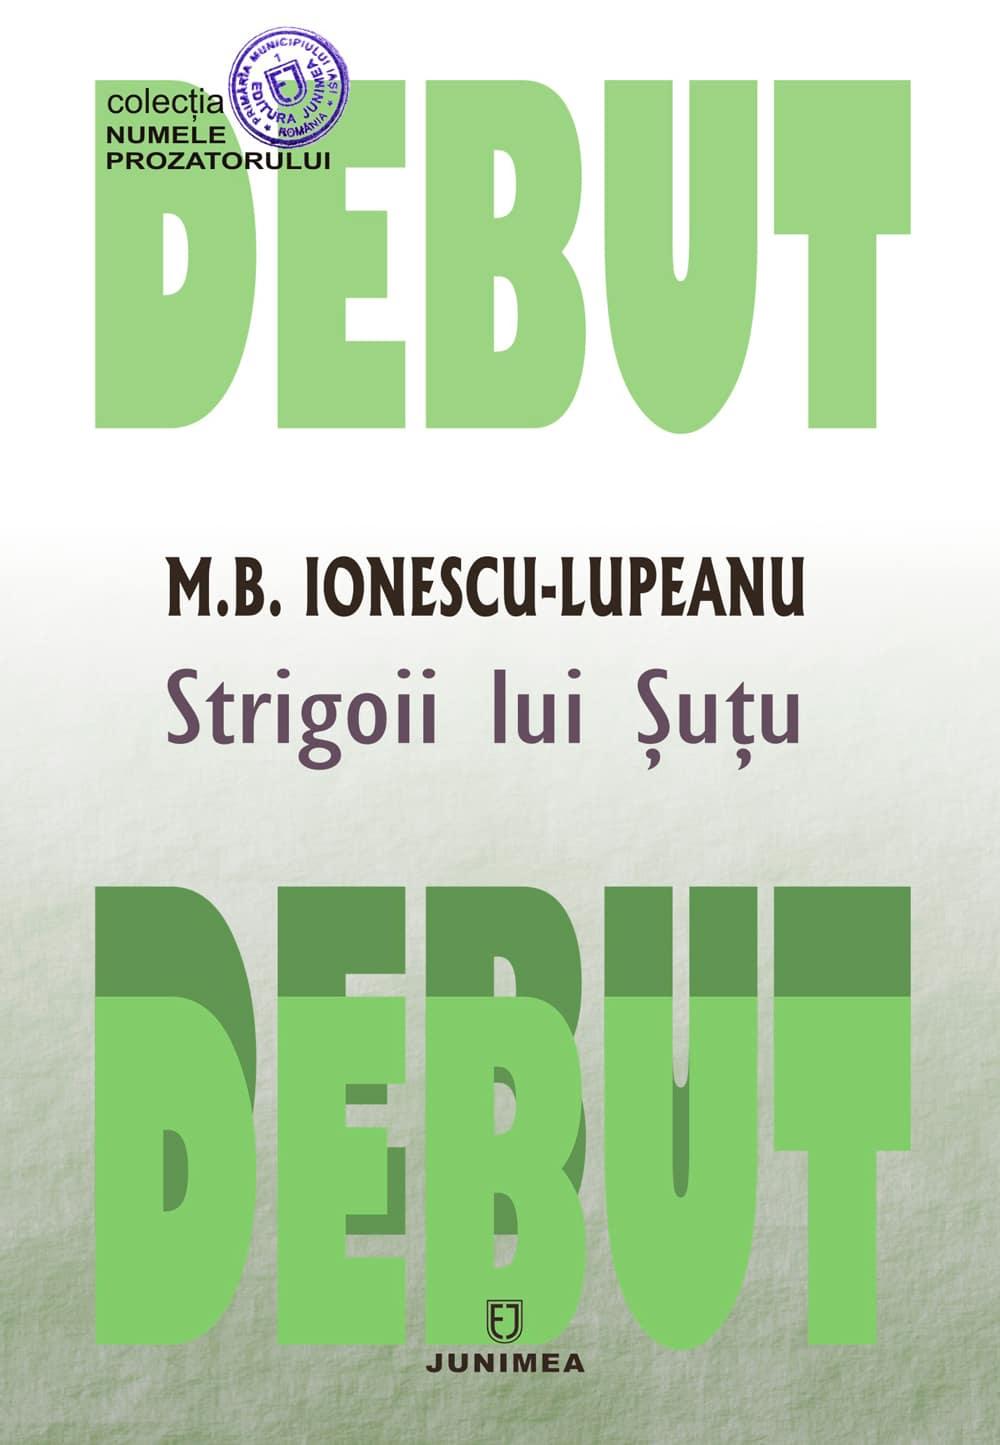 M.B. Ionescu-Lupeanu, Strigoii lui Şuţu